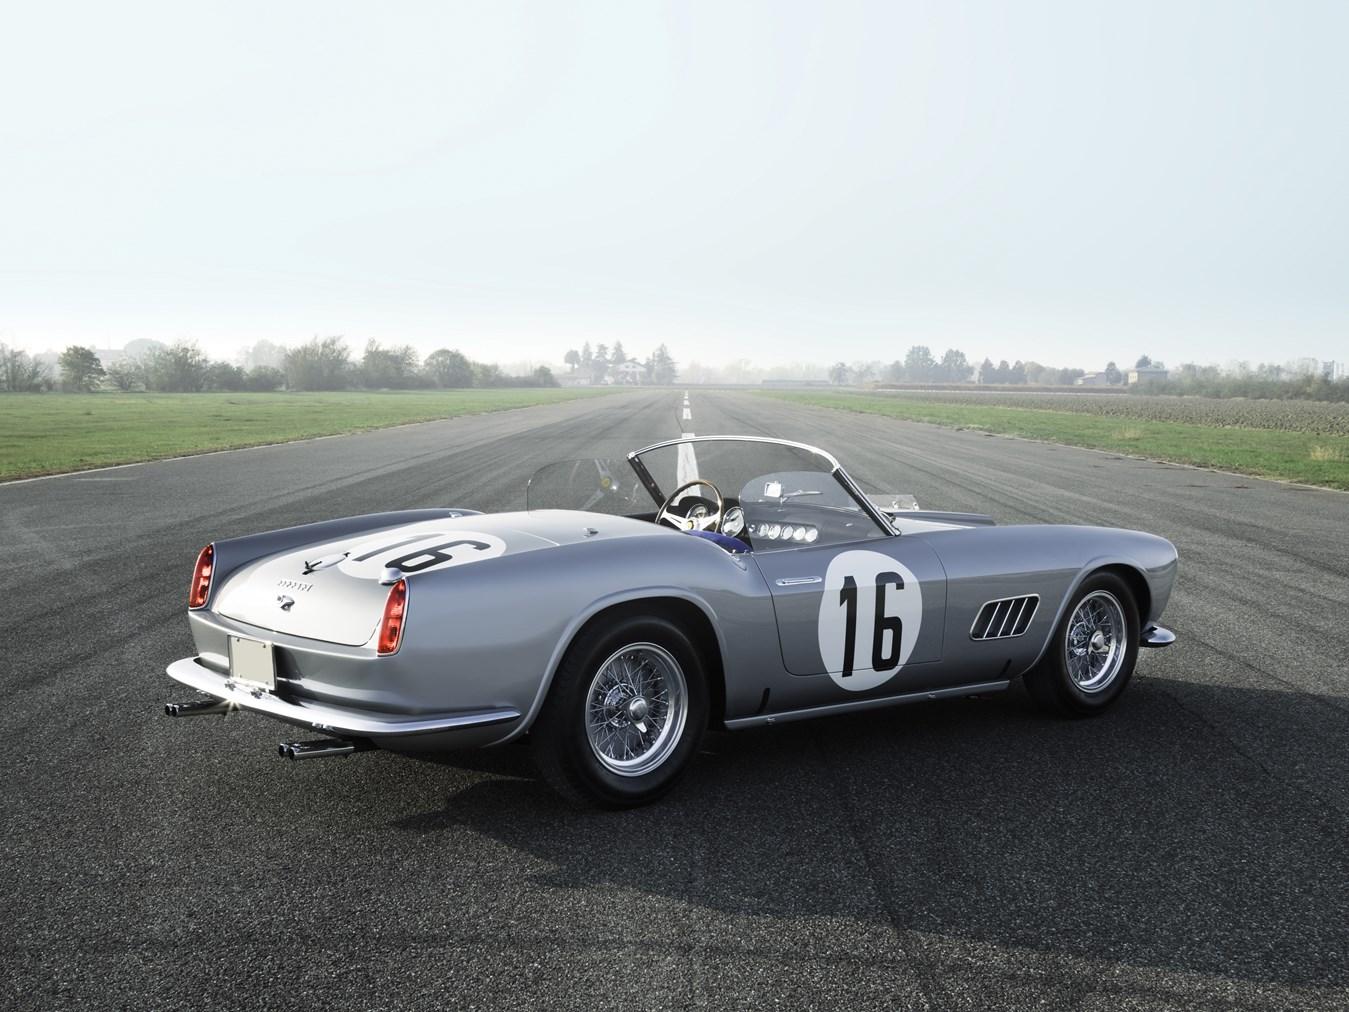 le mans-racing ferrari 250 gt lwb california heading to auction